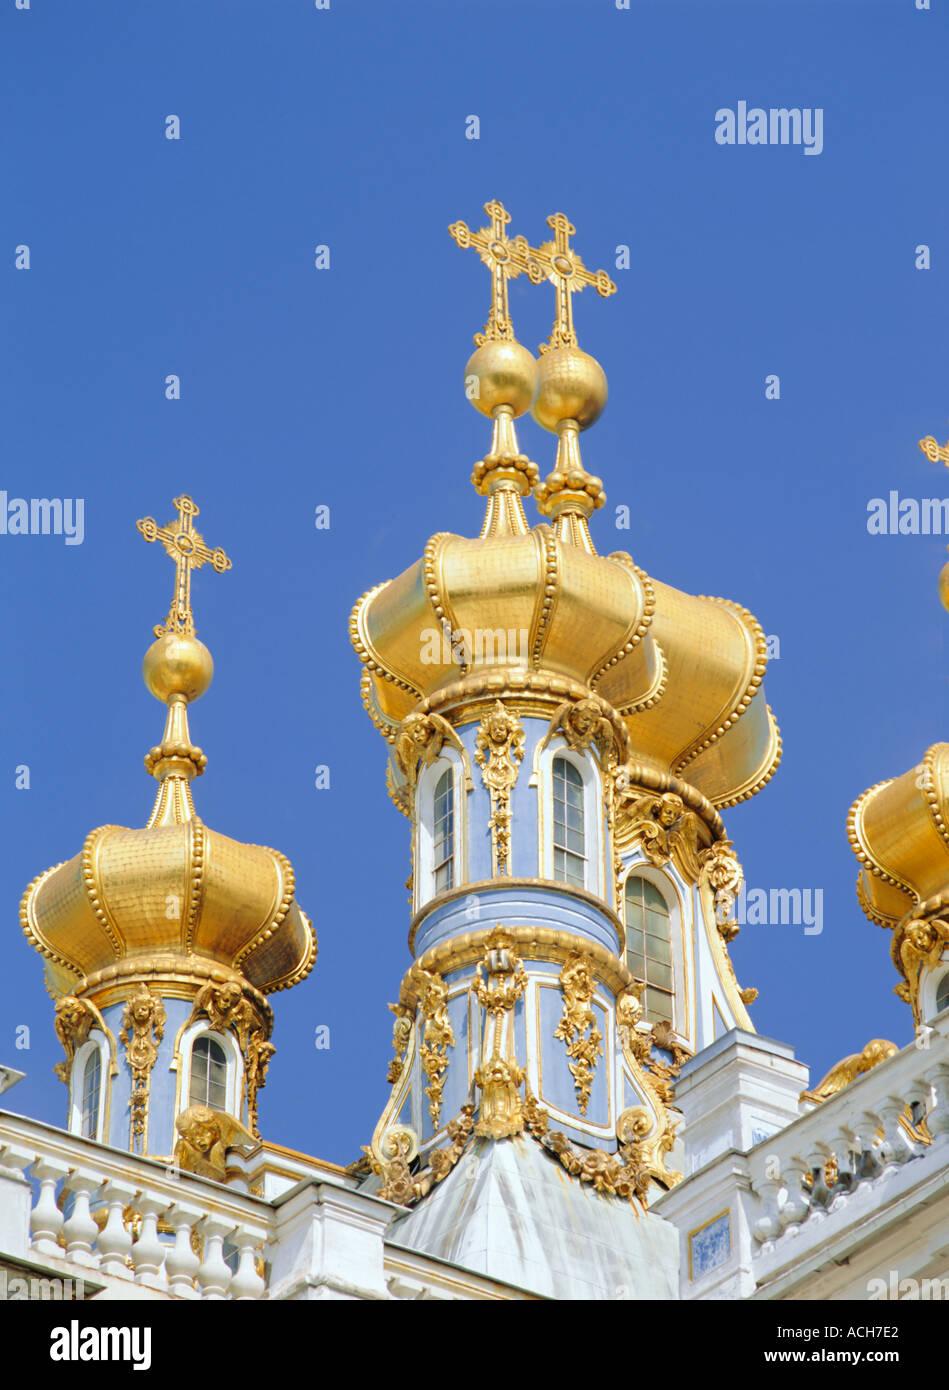 Cupolas of the Royal Chapel Catherine Palace Pushkin Russia Europe - Stock Image